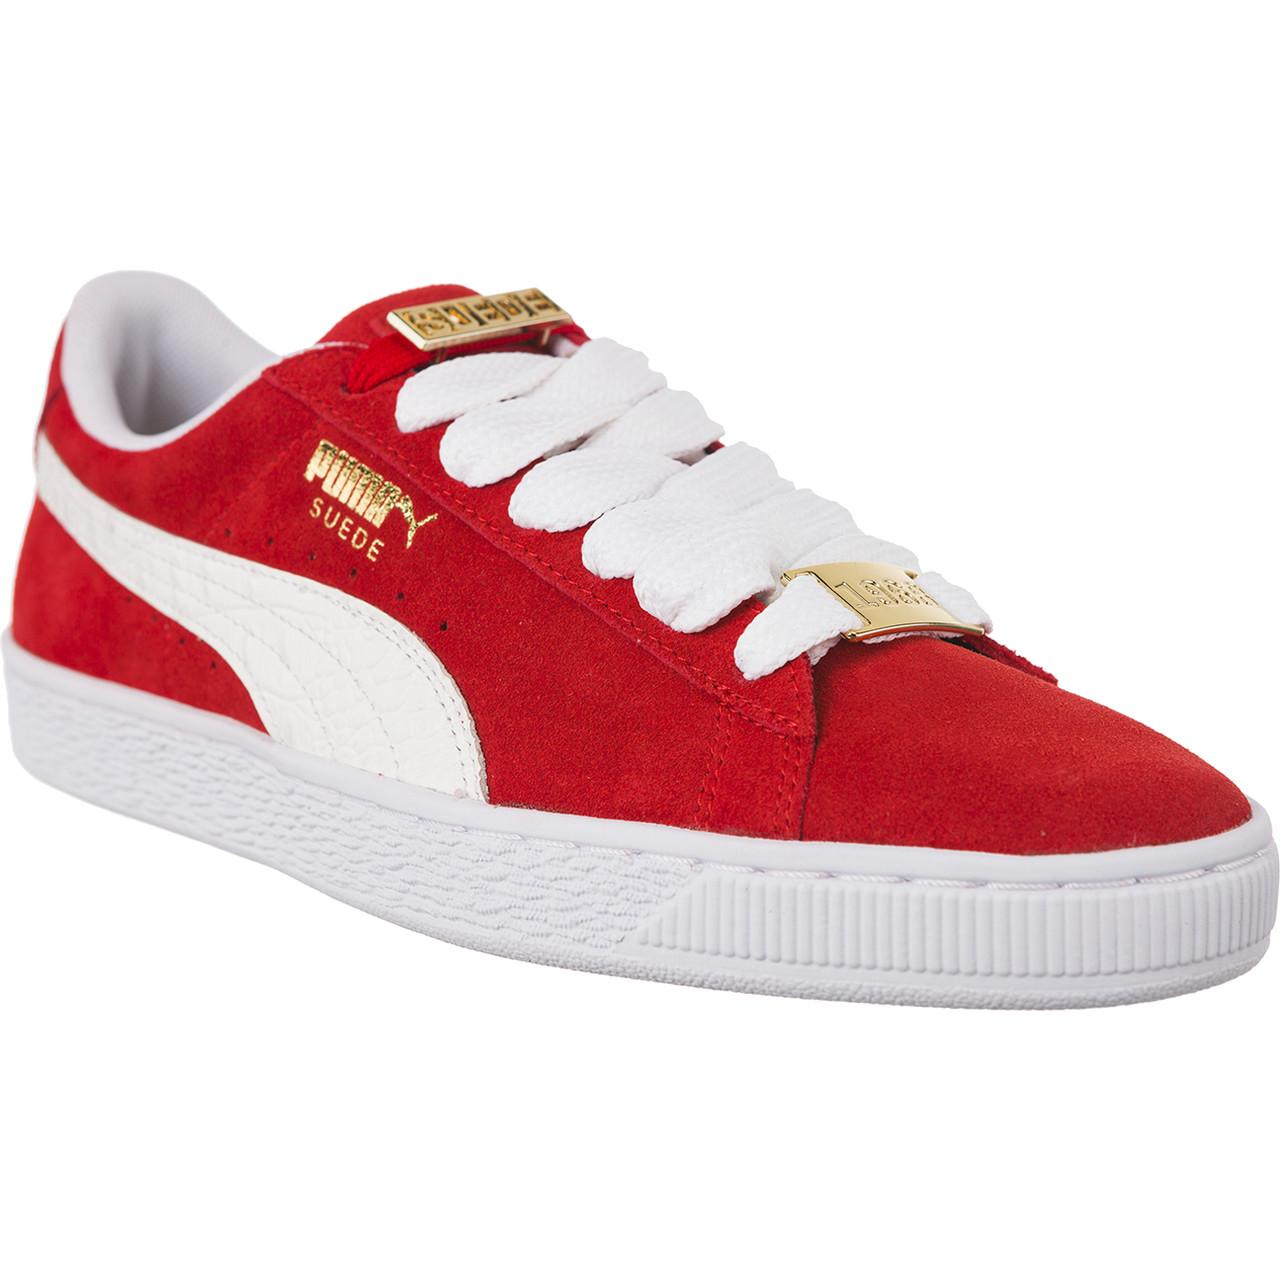 Puma sepatu sneaker suede classic BBOY fabulous - 36536202 - merah